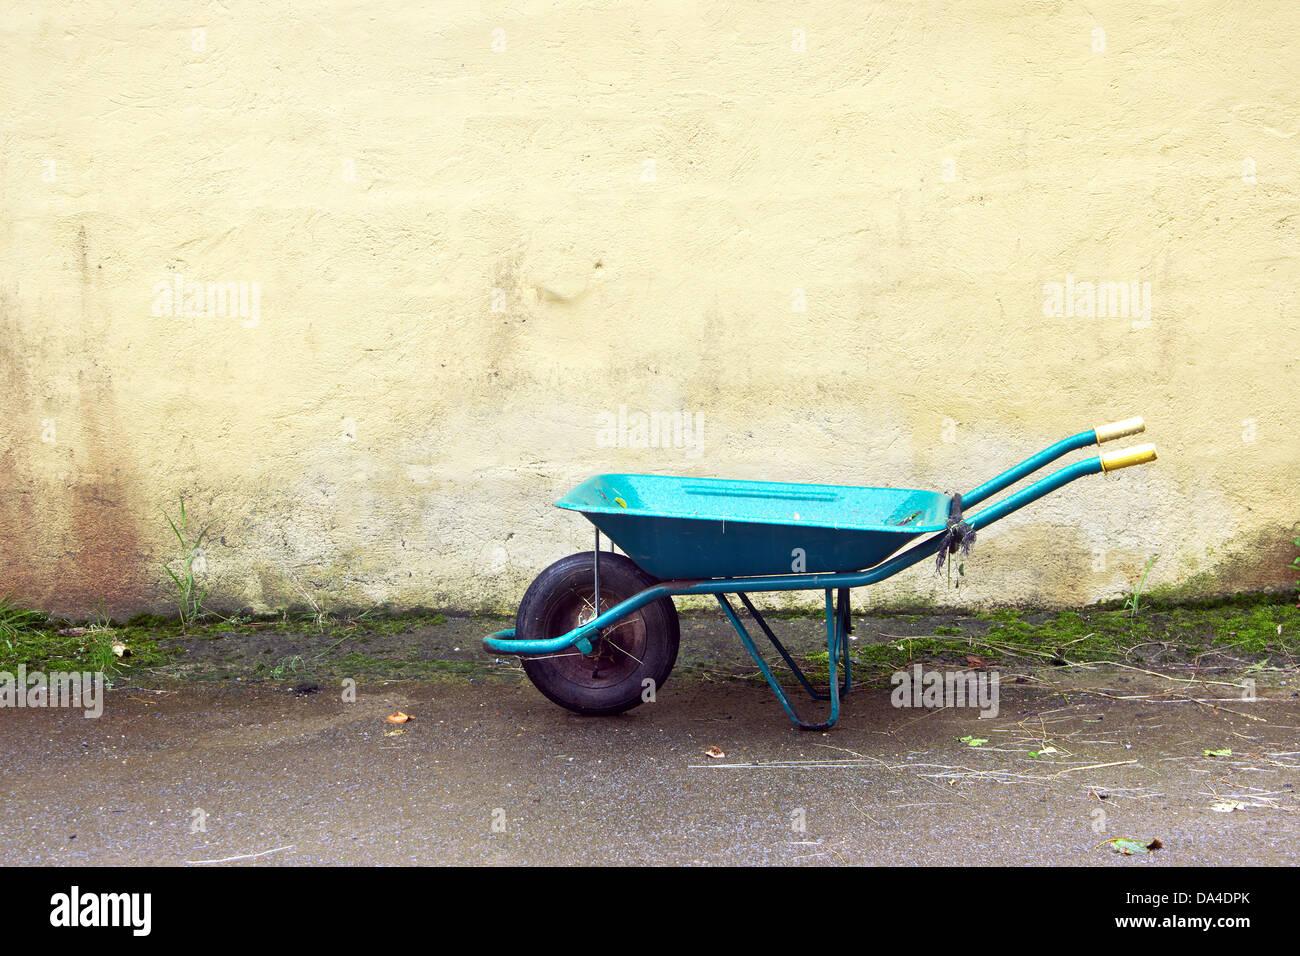 gardening wheelbarrow on a wall - Stock Image